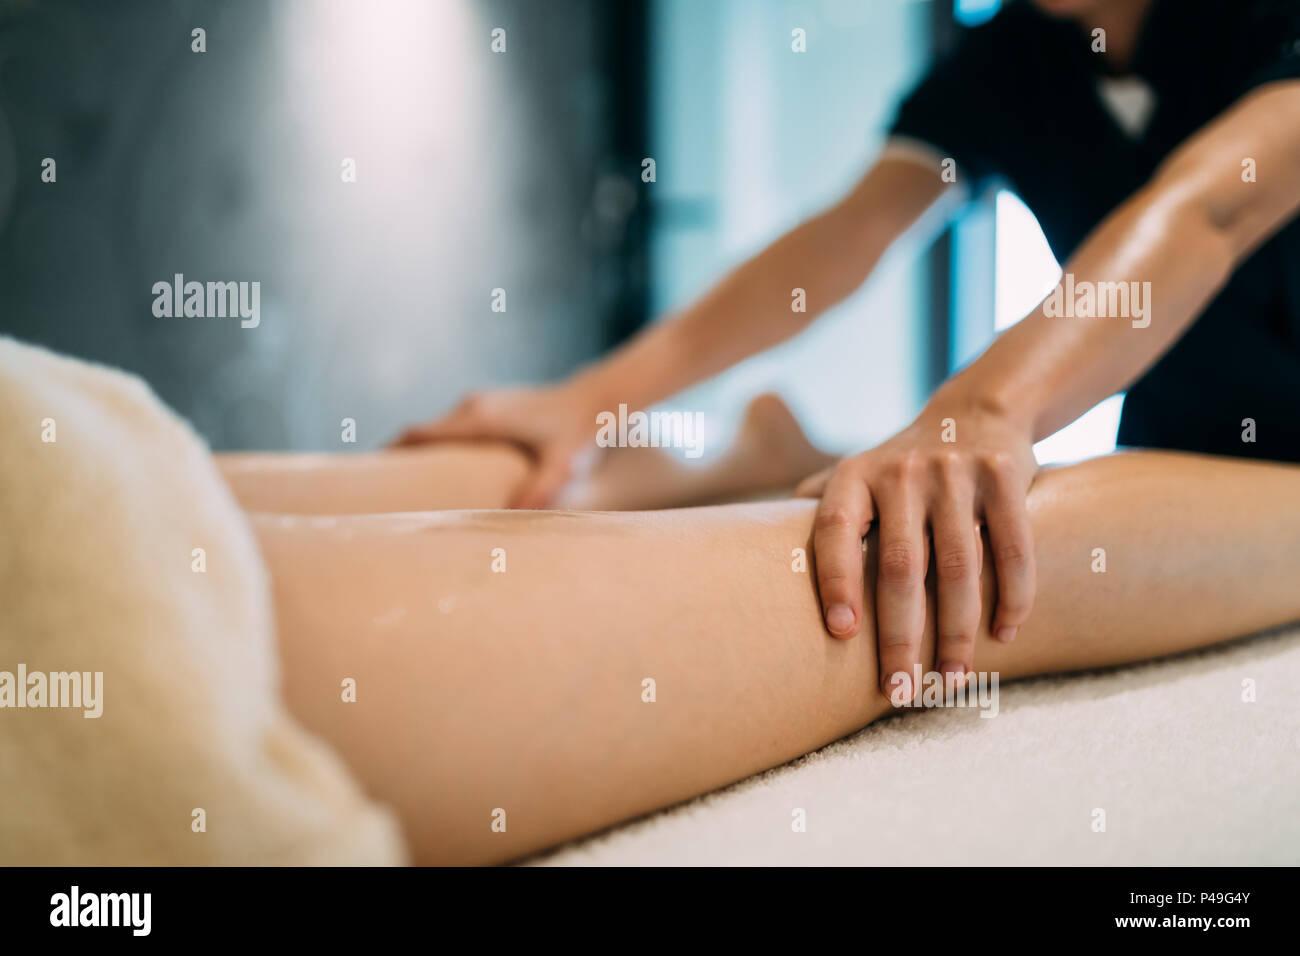 Masseur massaging masseuse during therapeutic tretment - Stock Image